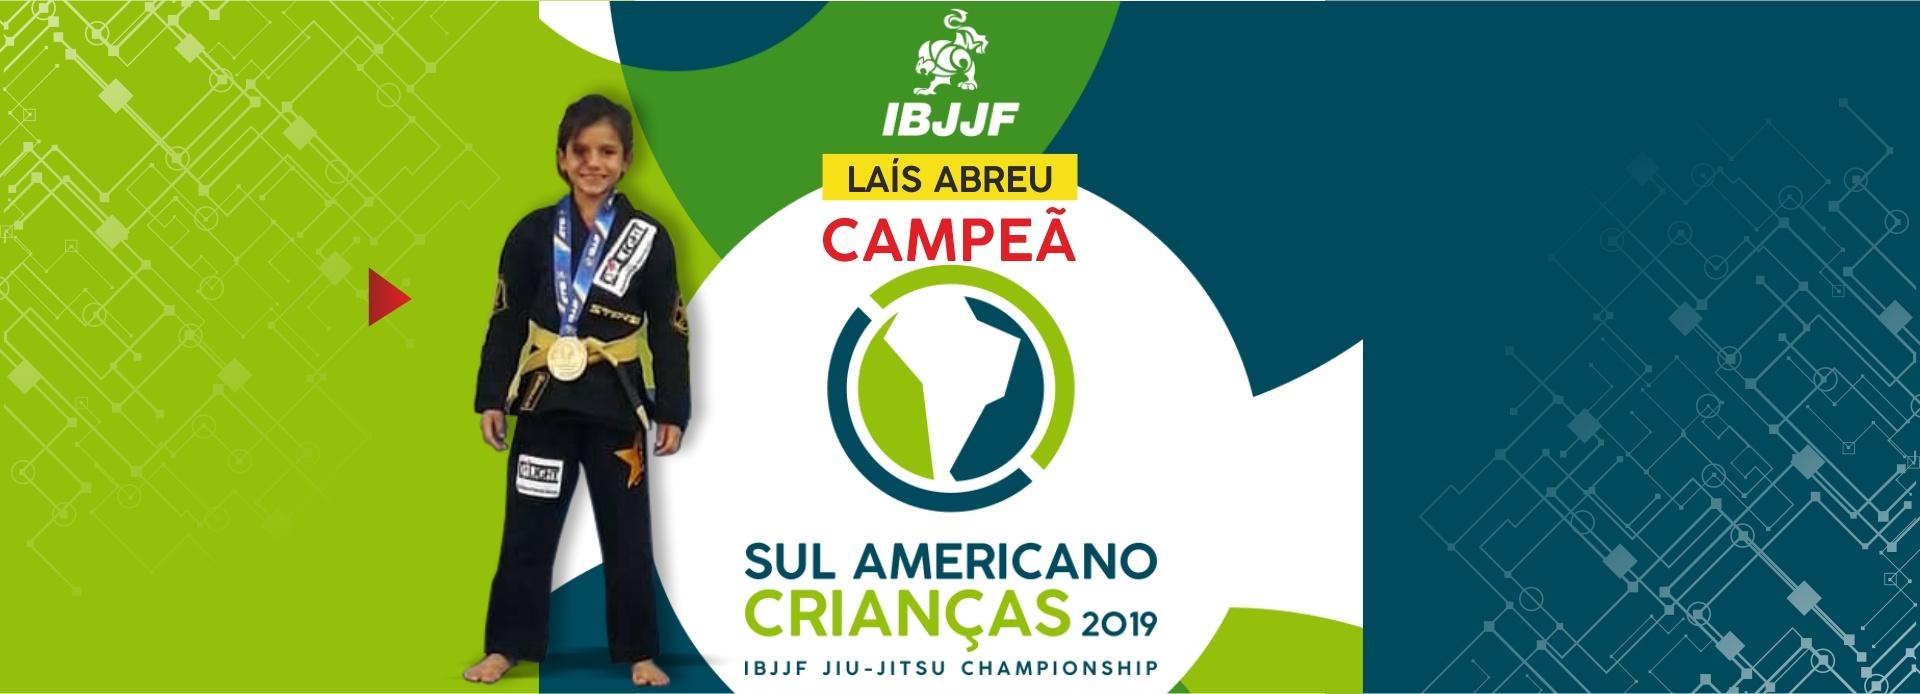 Lais Campeã Sul Americana